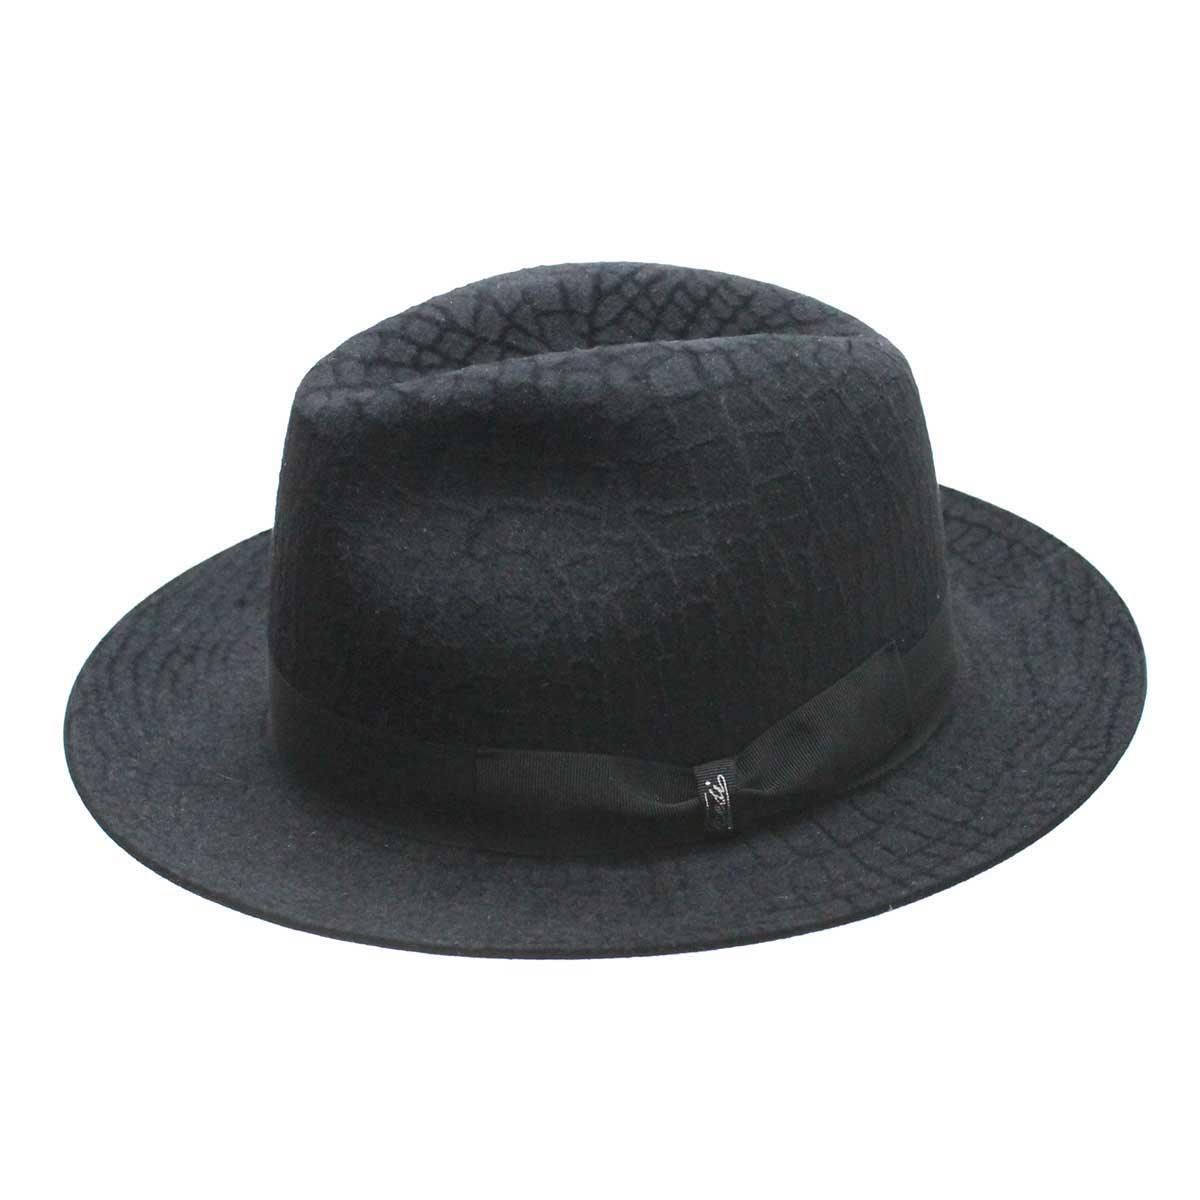 Tesi(テシ) 中折れハット(クロコダイル柄)(REDECKER帽子ブラシ付)